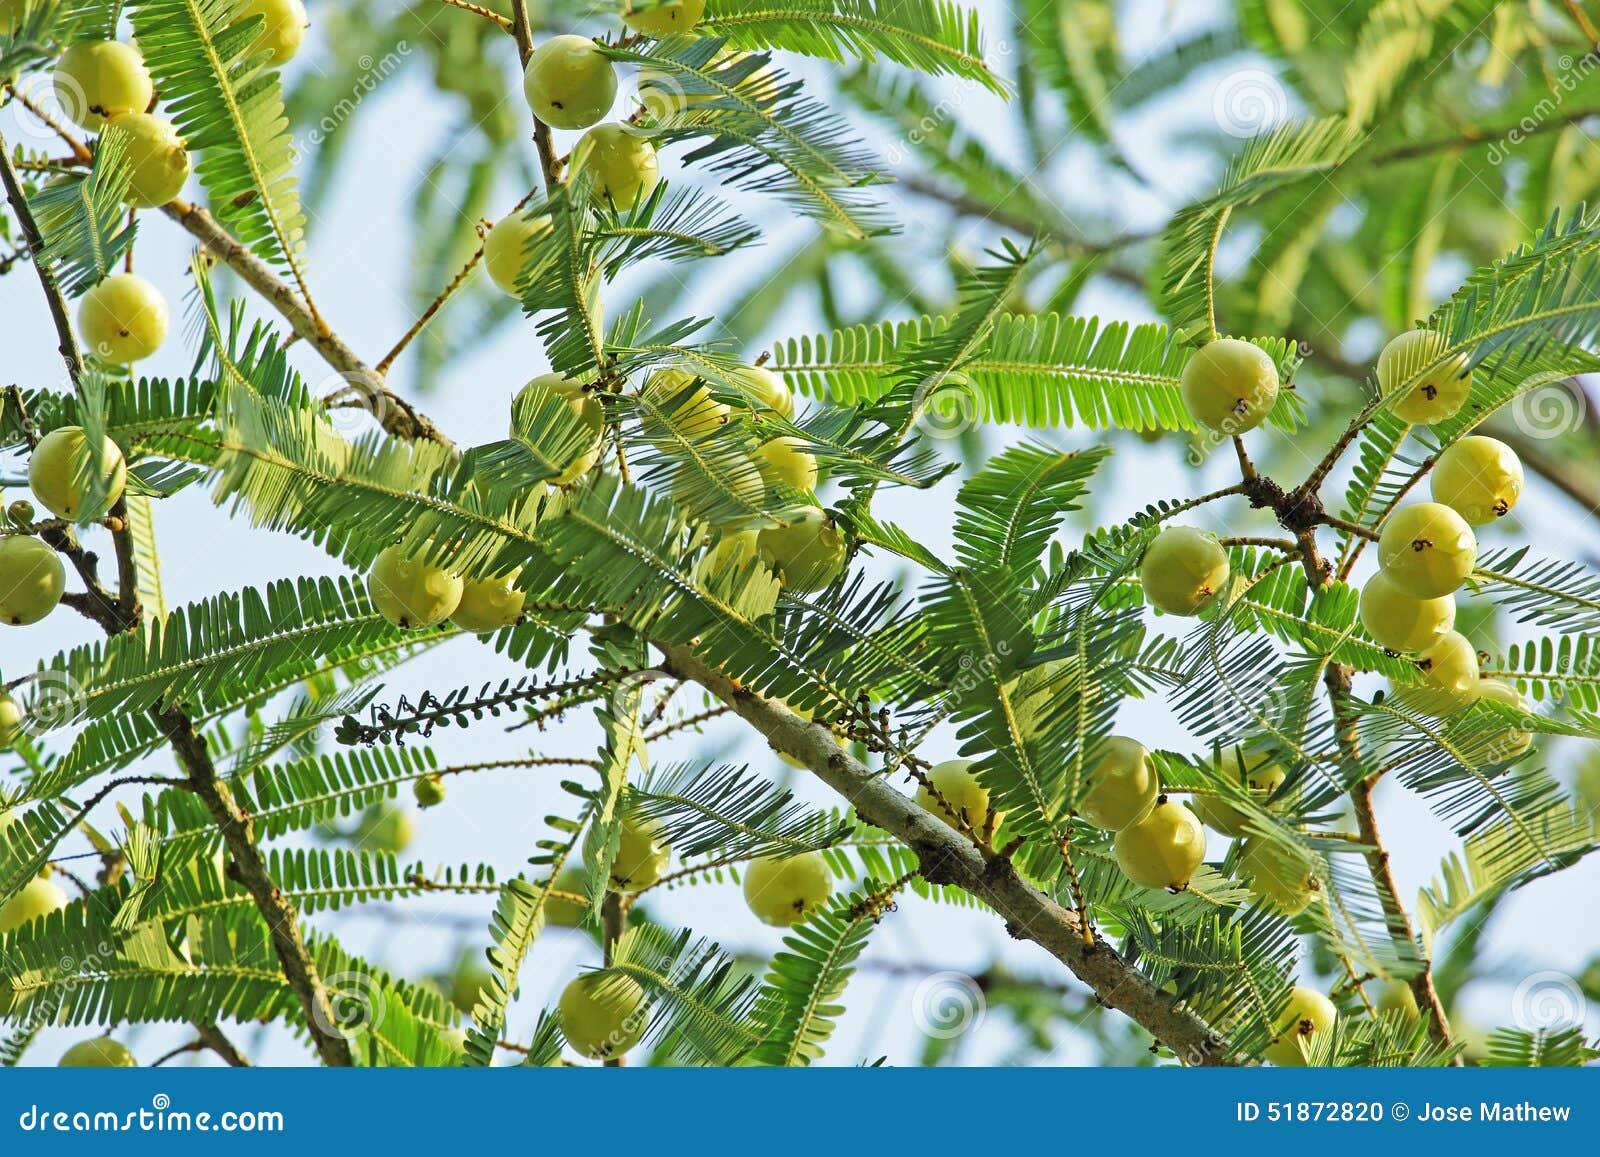 groseille maquereau indienne phyllanthus emblica photo stock image 51872820. Black Bedroom Furniture Sets. Home Design Ideas